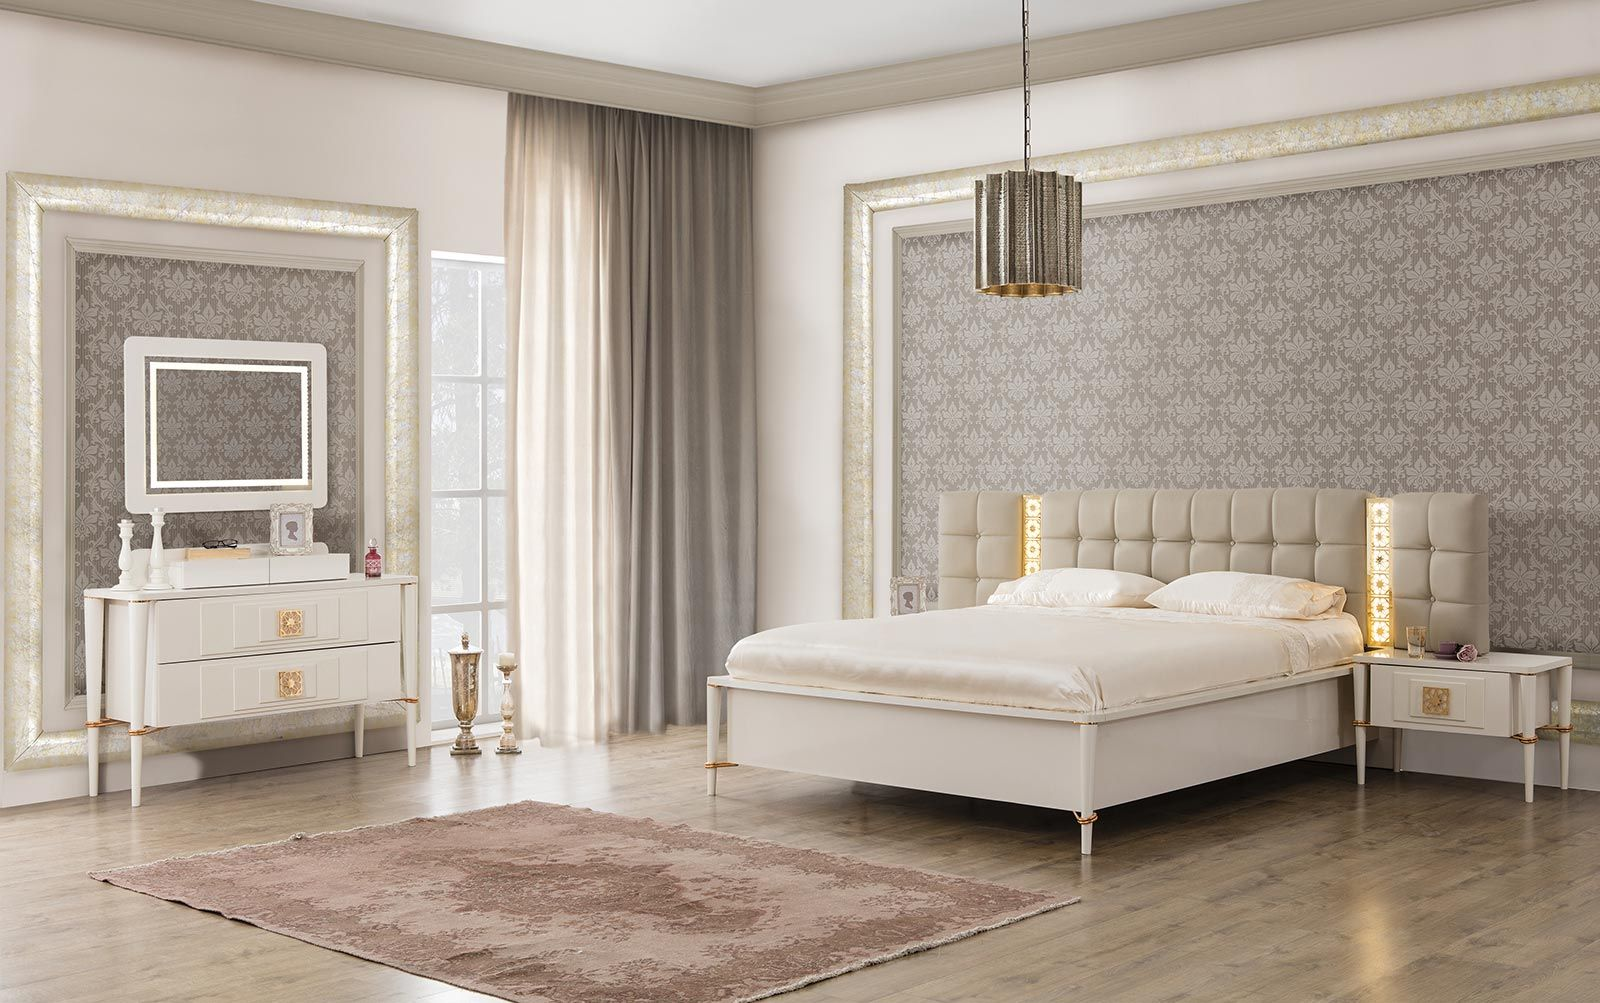 Alessa Yatak Odasi Family Group Design Furniture Bedroom Interior Wholesale Furniture Modern Home Furniture